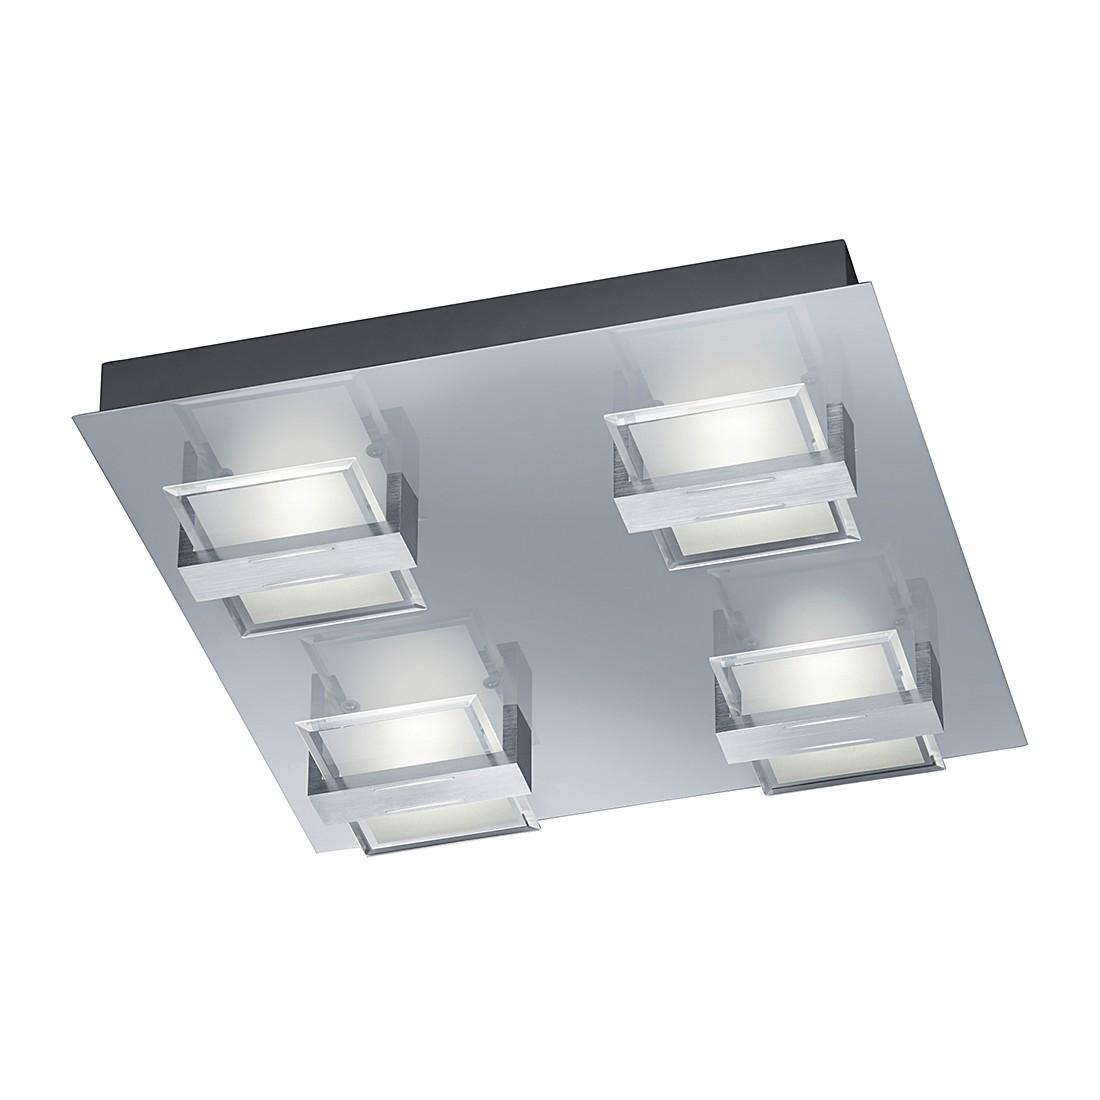 EEK A+, LED-Deckenleuchte – 4-flammig, Trio günstig